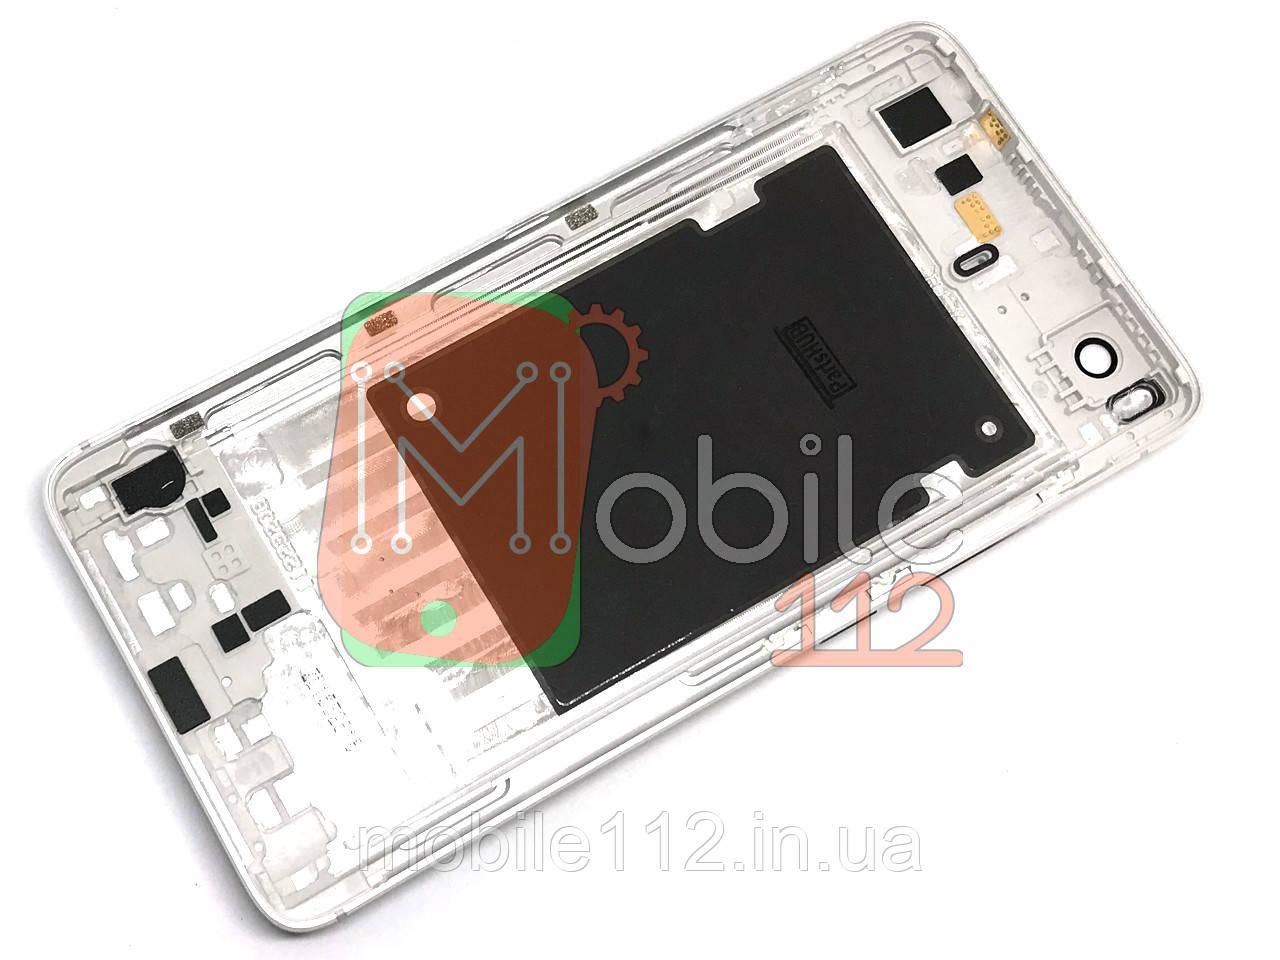 Задняя крышка Xiaomi Mi5S Mi 5S серебристая оригинал Китай